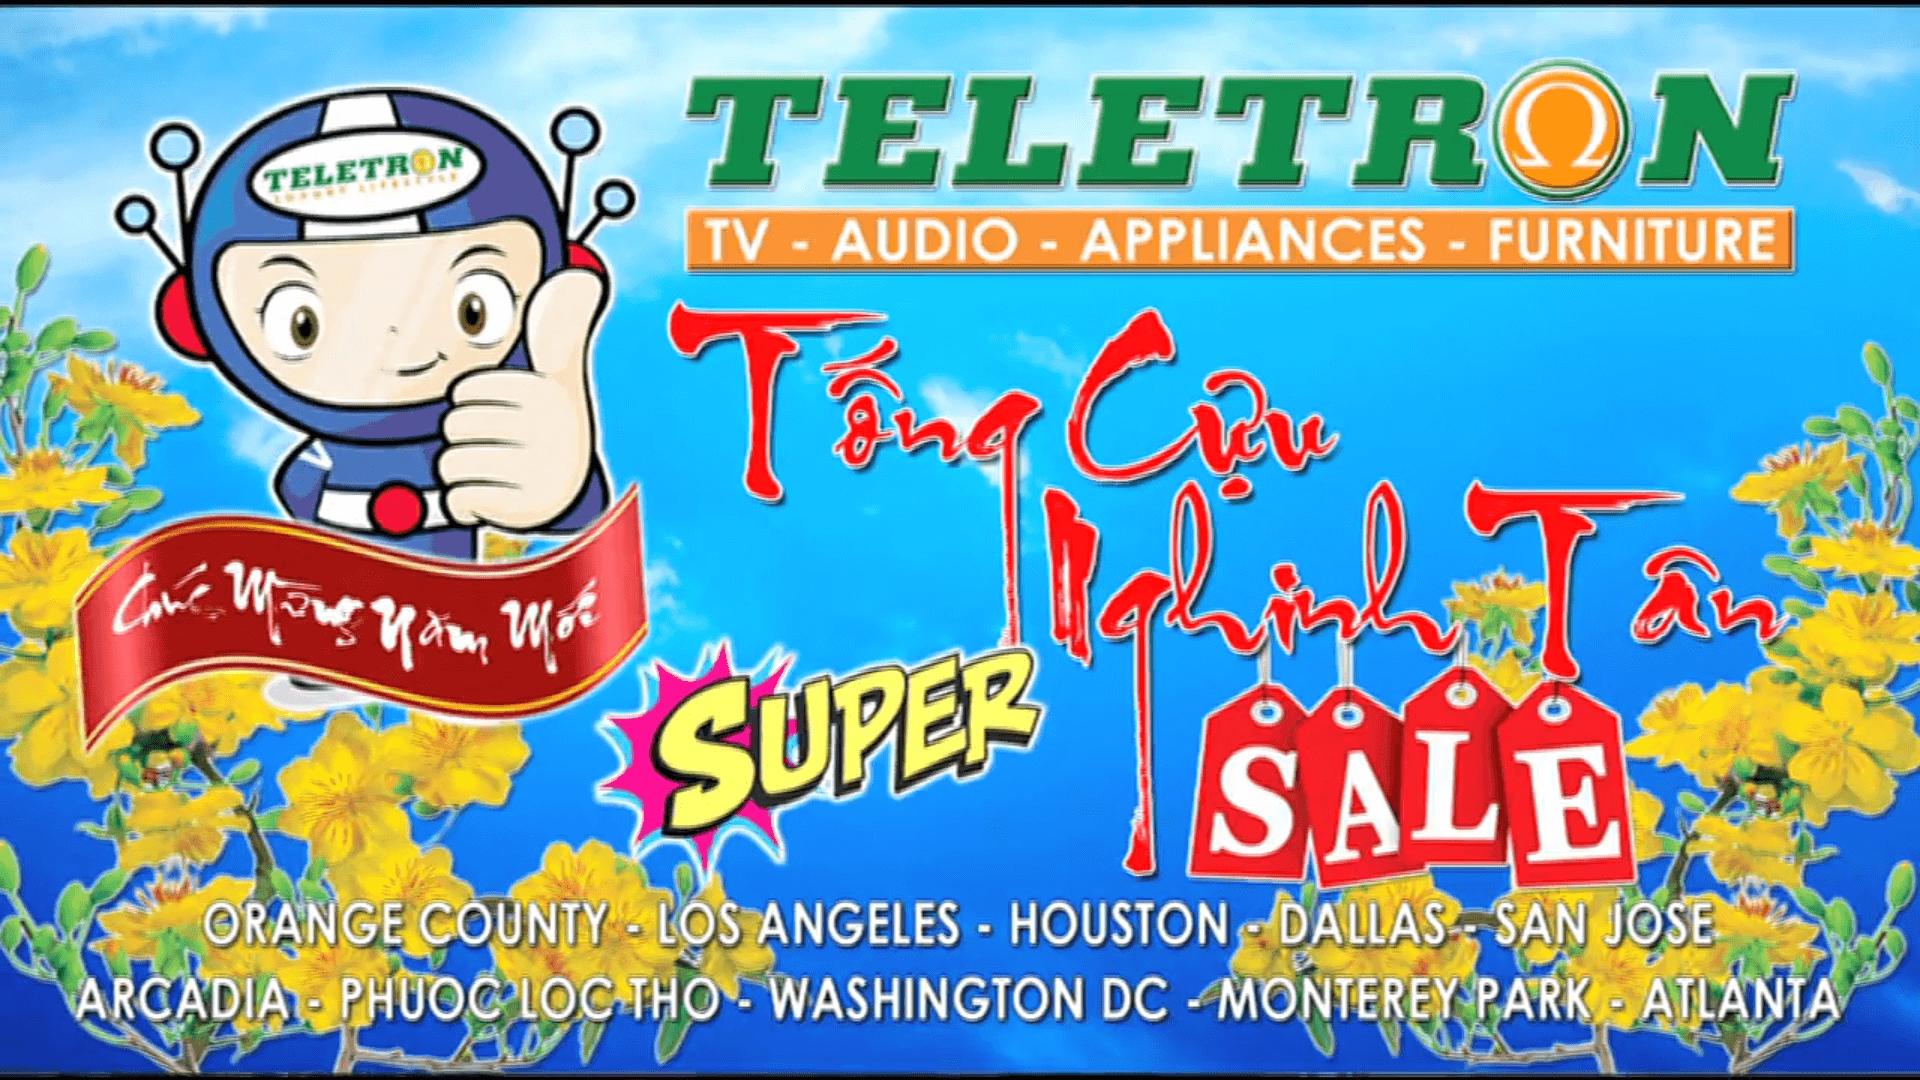 TELETRON HOLIDAY SALE 2017 DEC 18 JAN 01 WDC